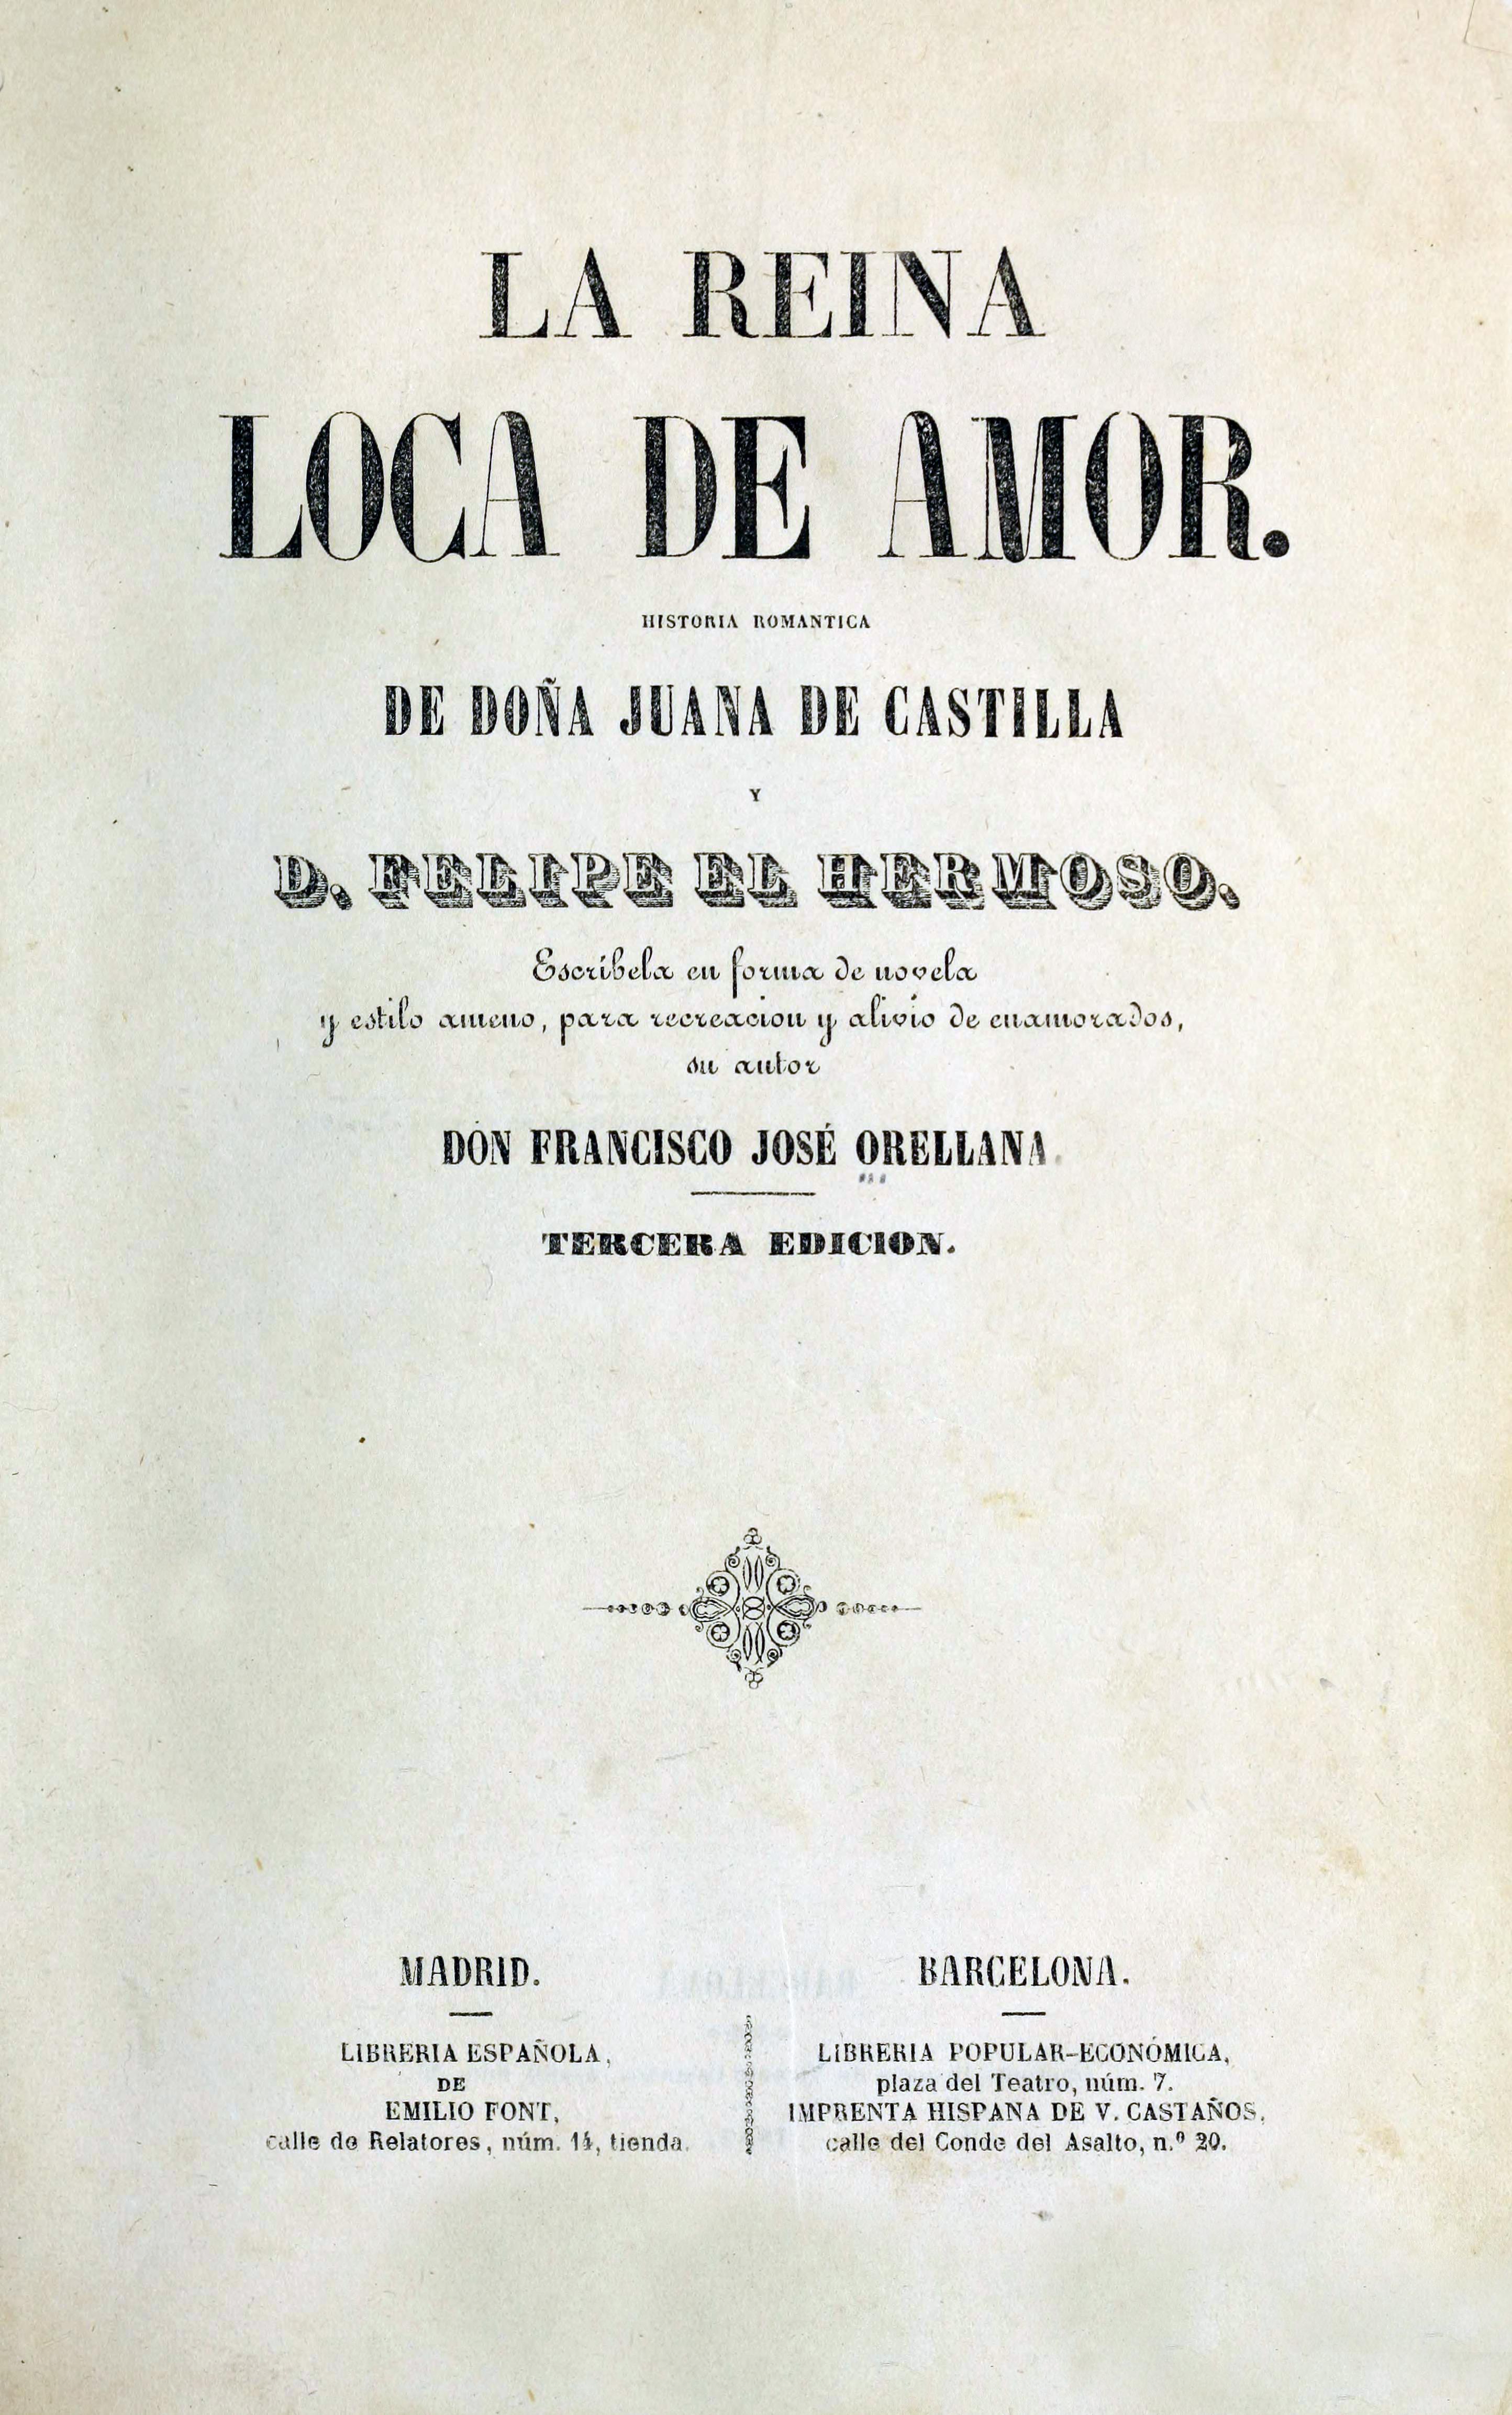 File:1862, La reina loca de amor, Francisco José Orellana.jpg